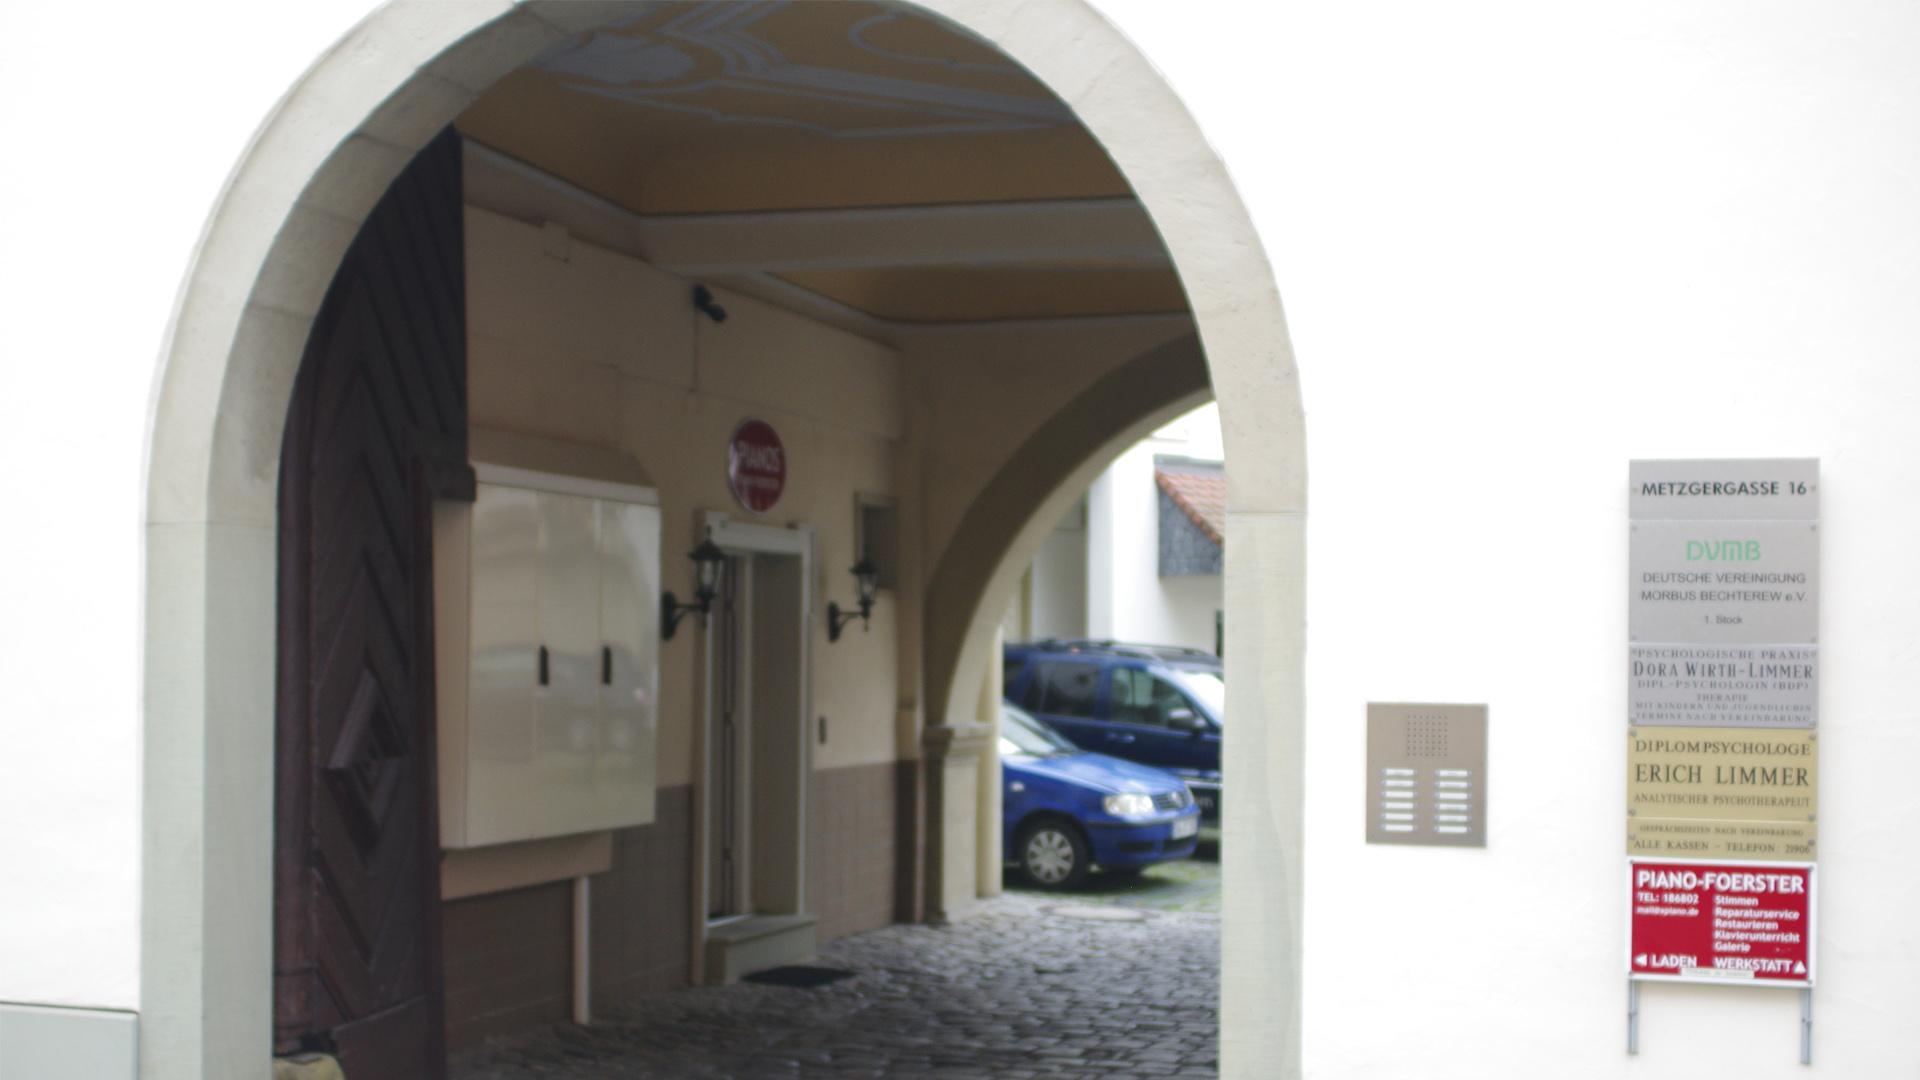 Eingang im Hinterhof | © Andrea Back